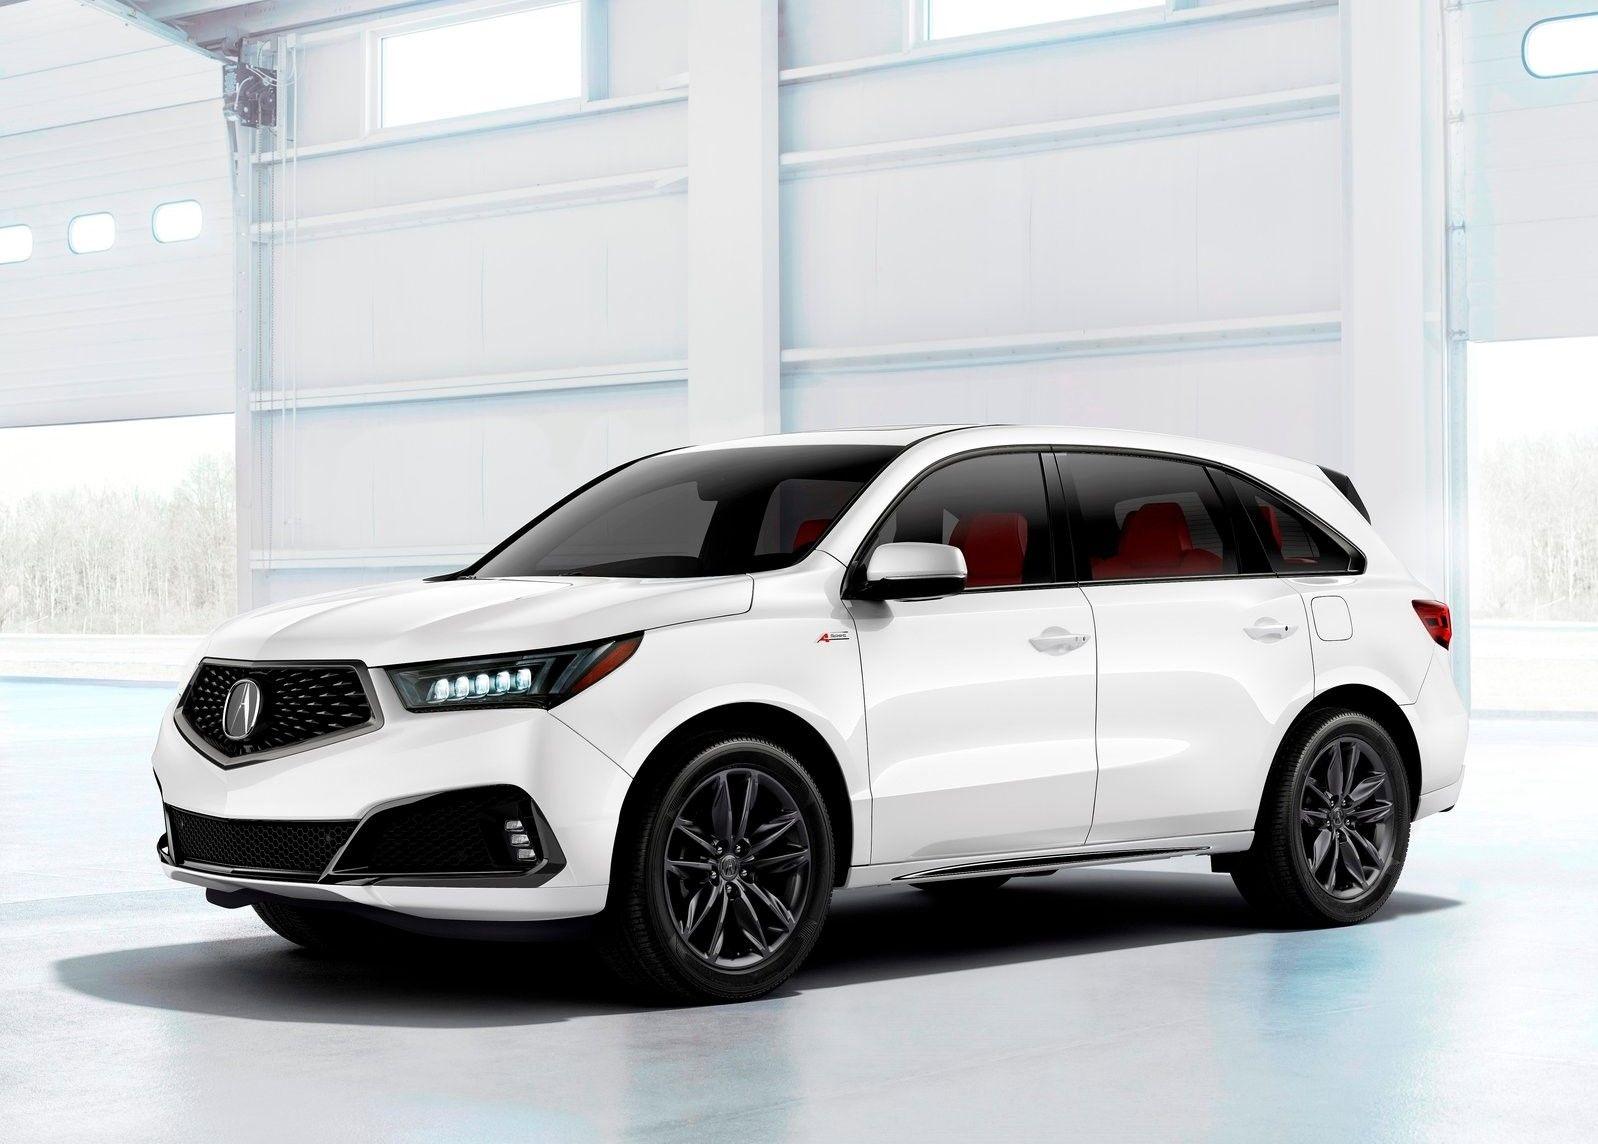 2019 Acura MDX: The Family Luxury SUV